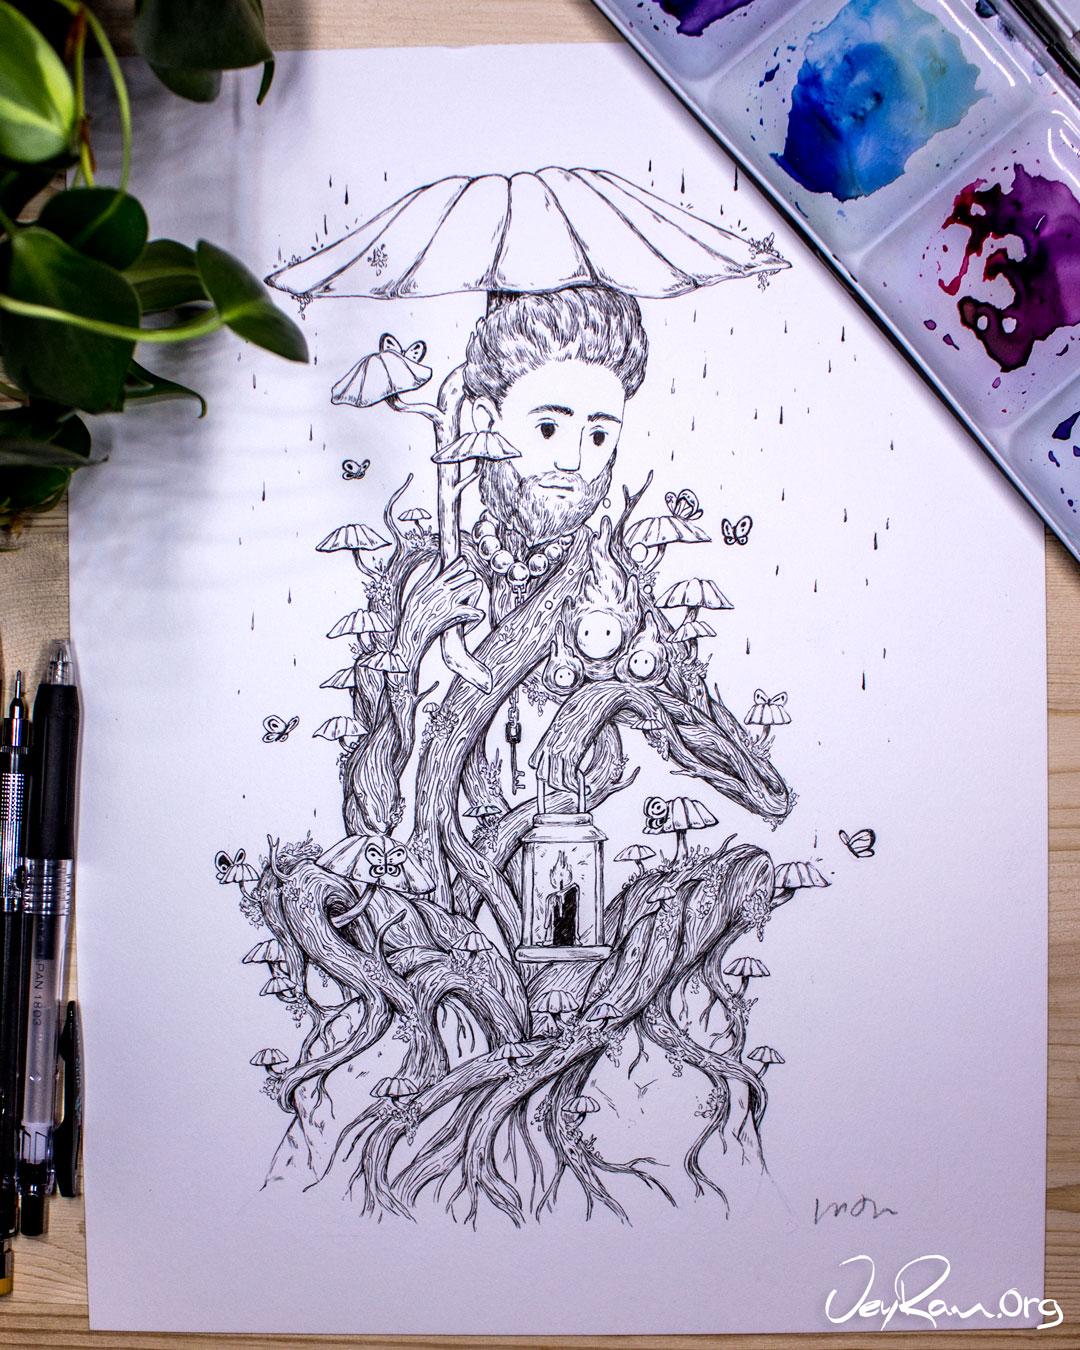 Marasmius Haematocephalu Mushroom Wizard - Ballpoint Pen Ink Art by JeyRam. #inktober #inkart #originalart #inktober2019 #mushroom #fungi